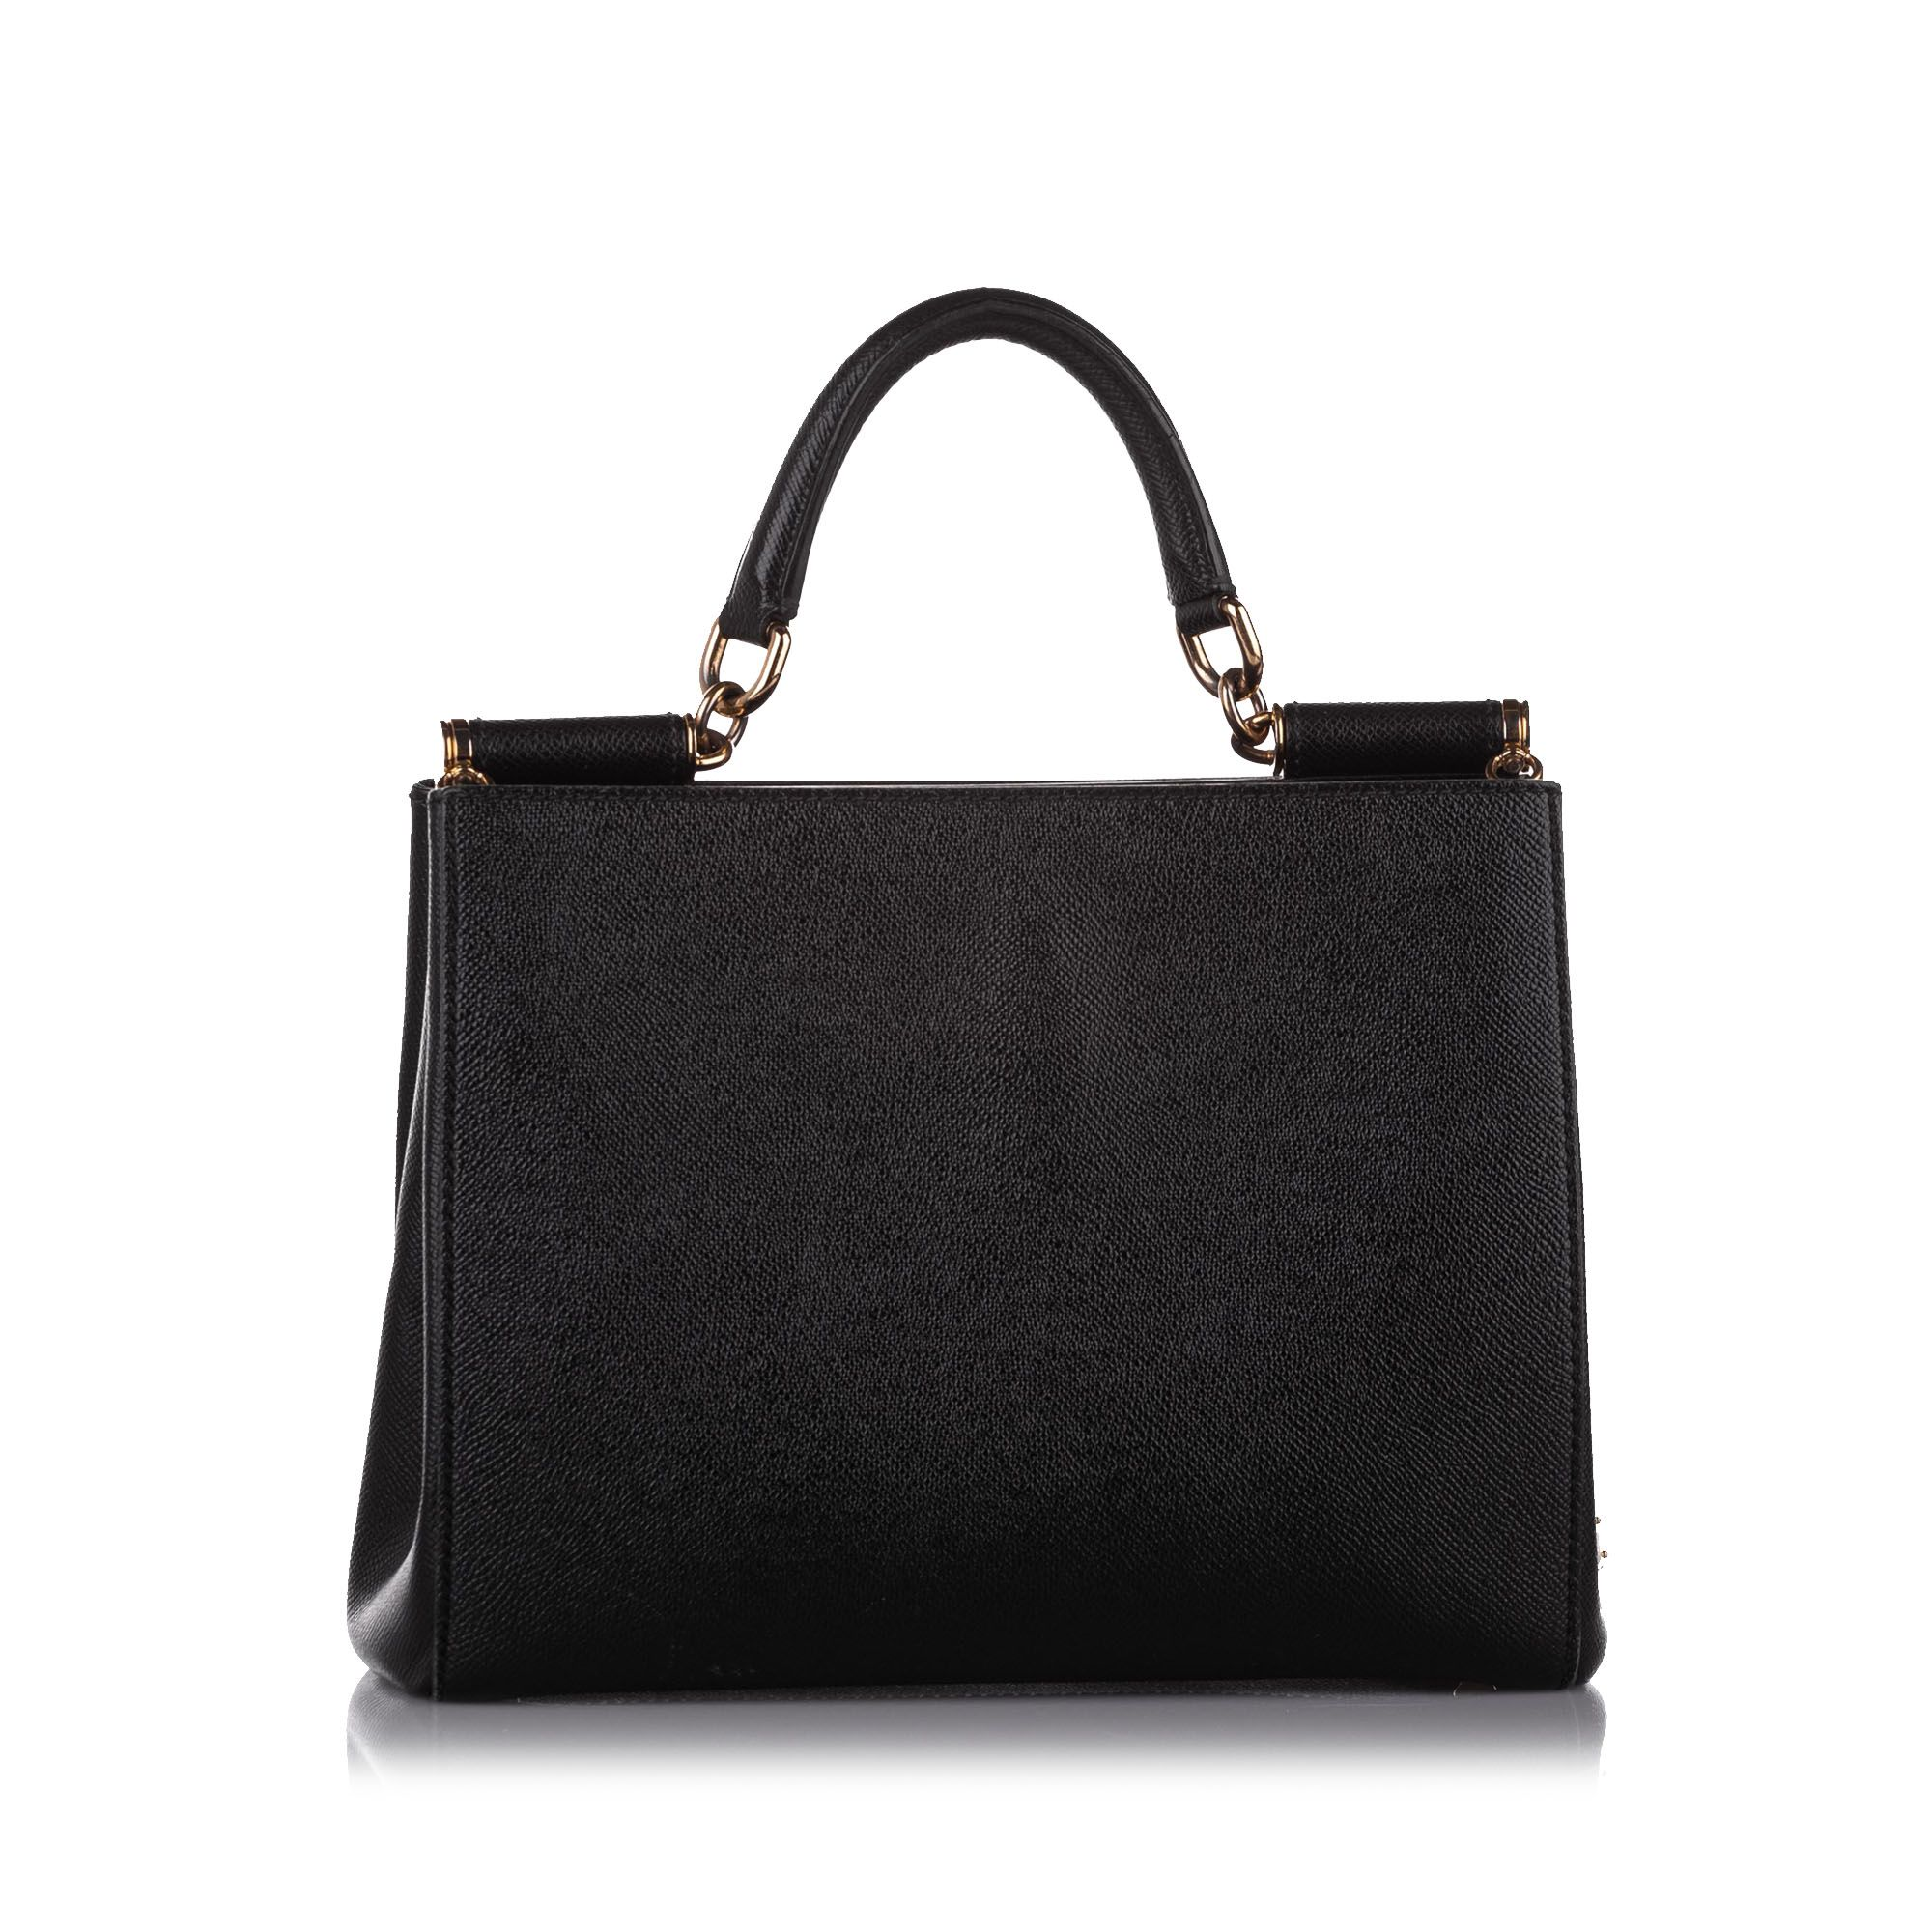 Vintage Dolce&Gabbana Miss Sicily Leather Satchel Black